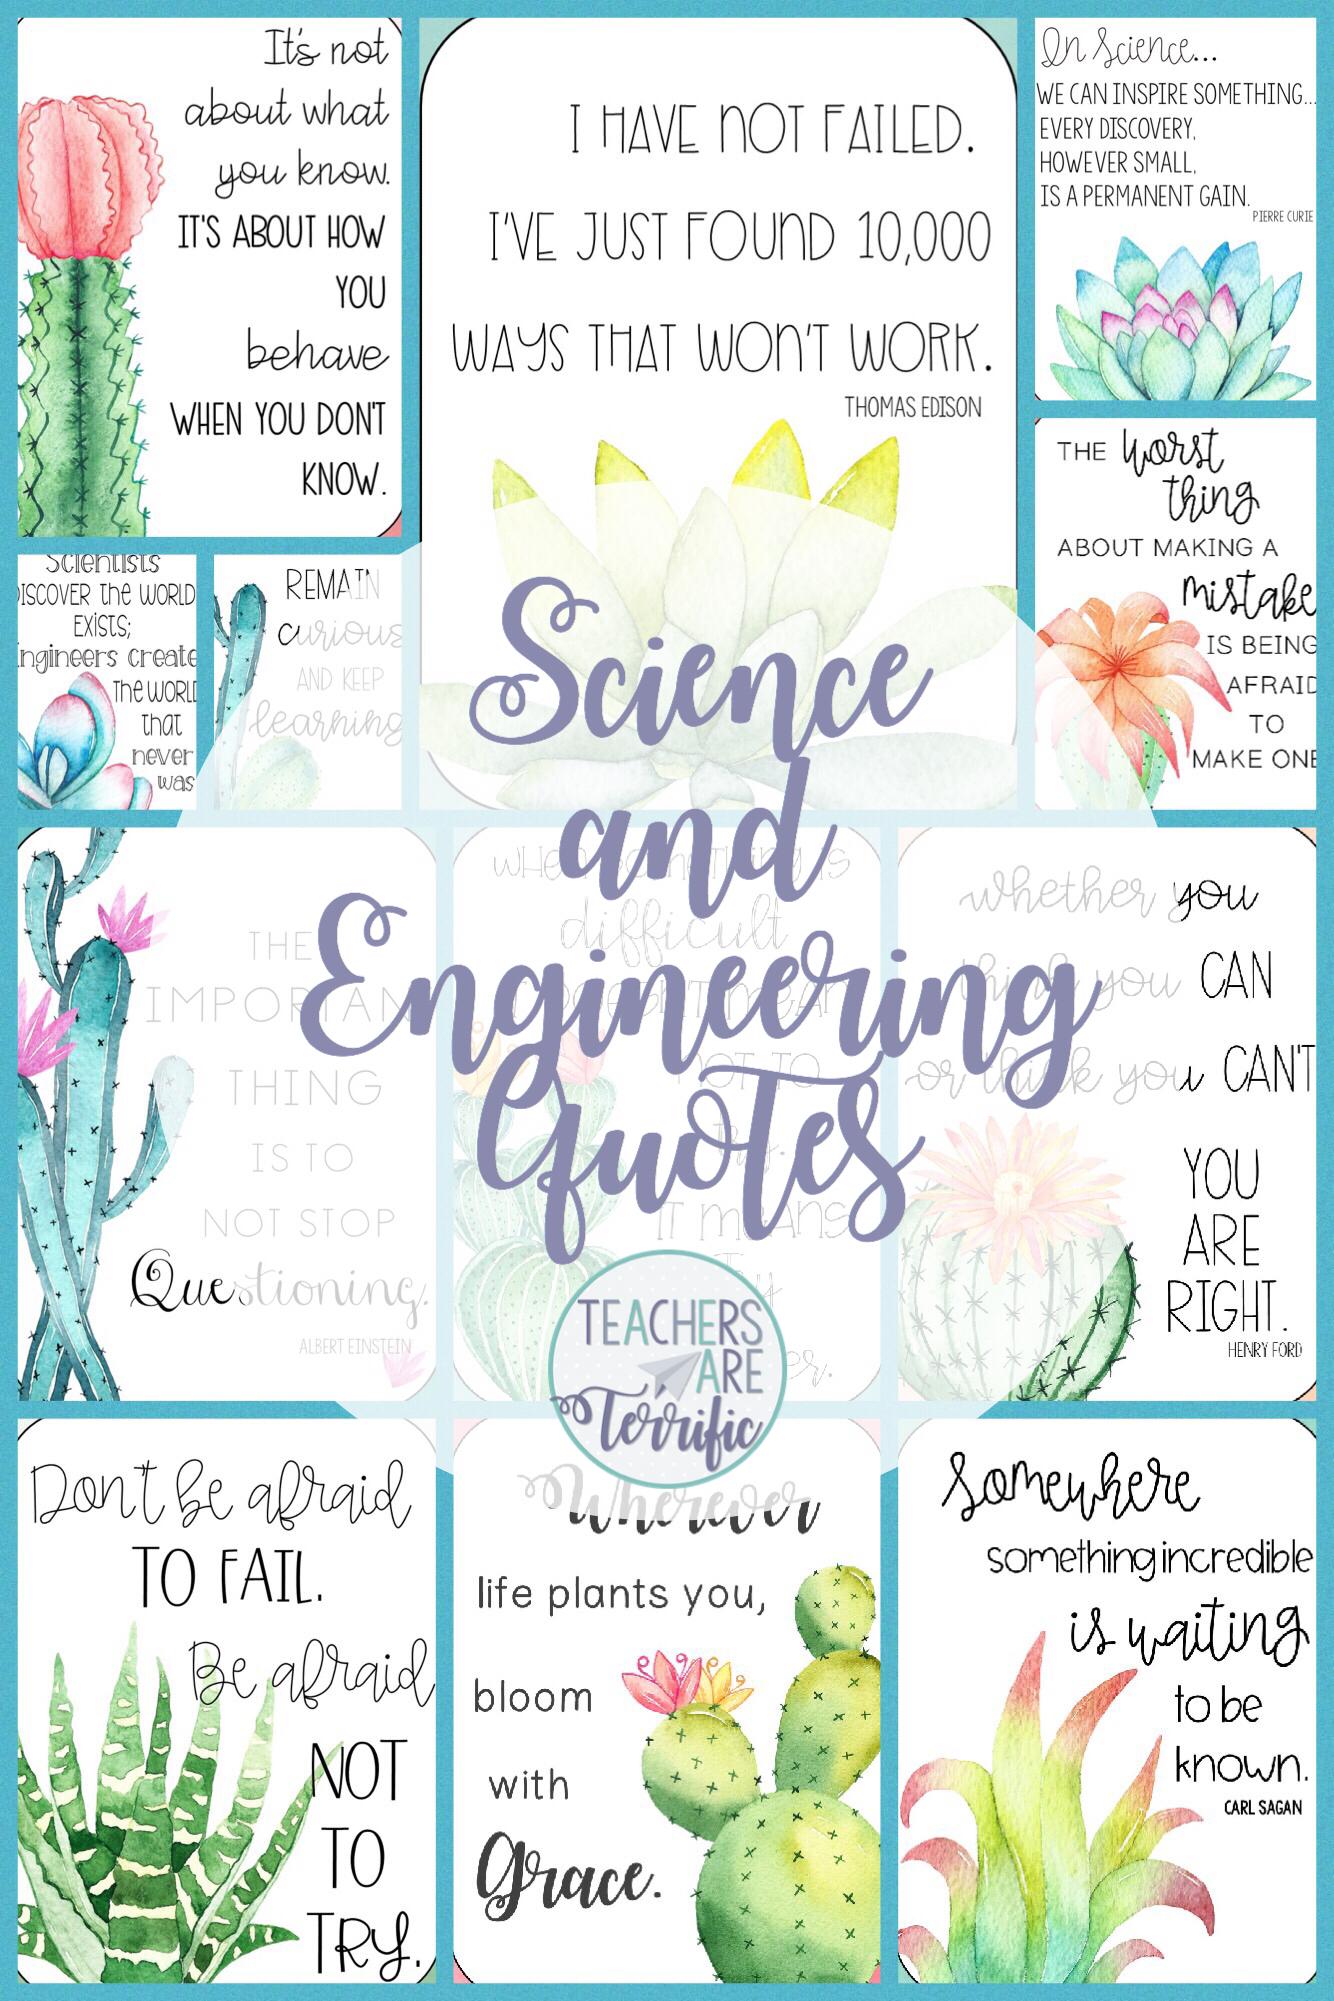 #scienceclassroom